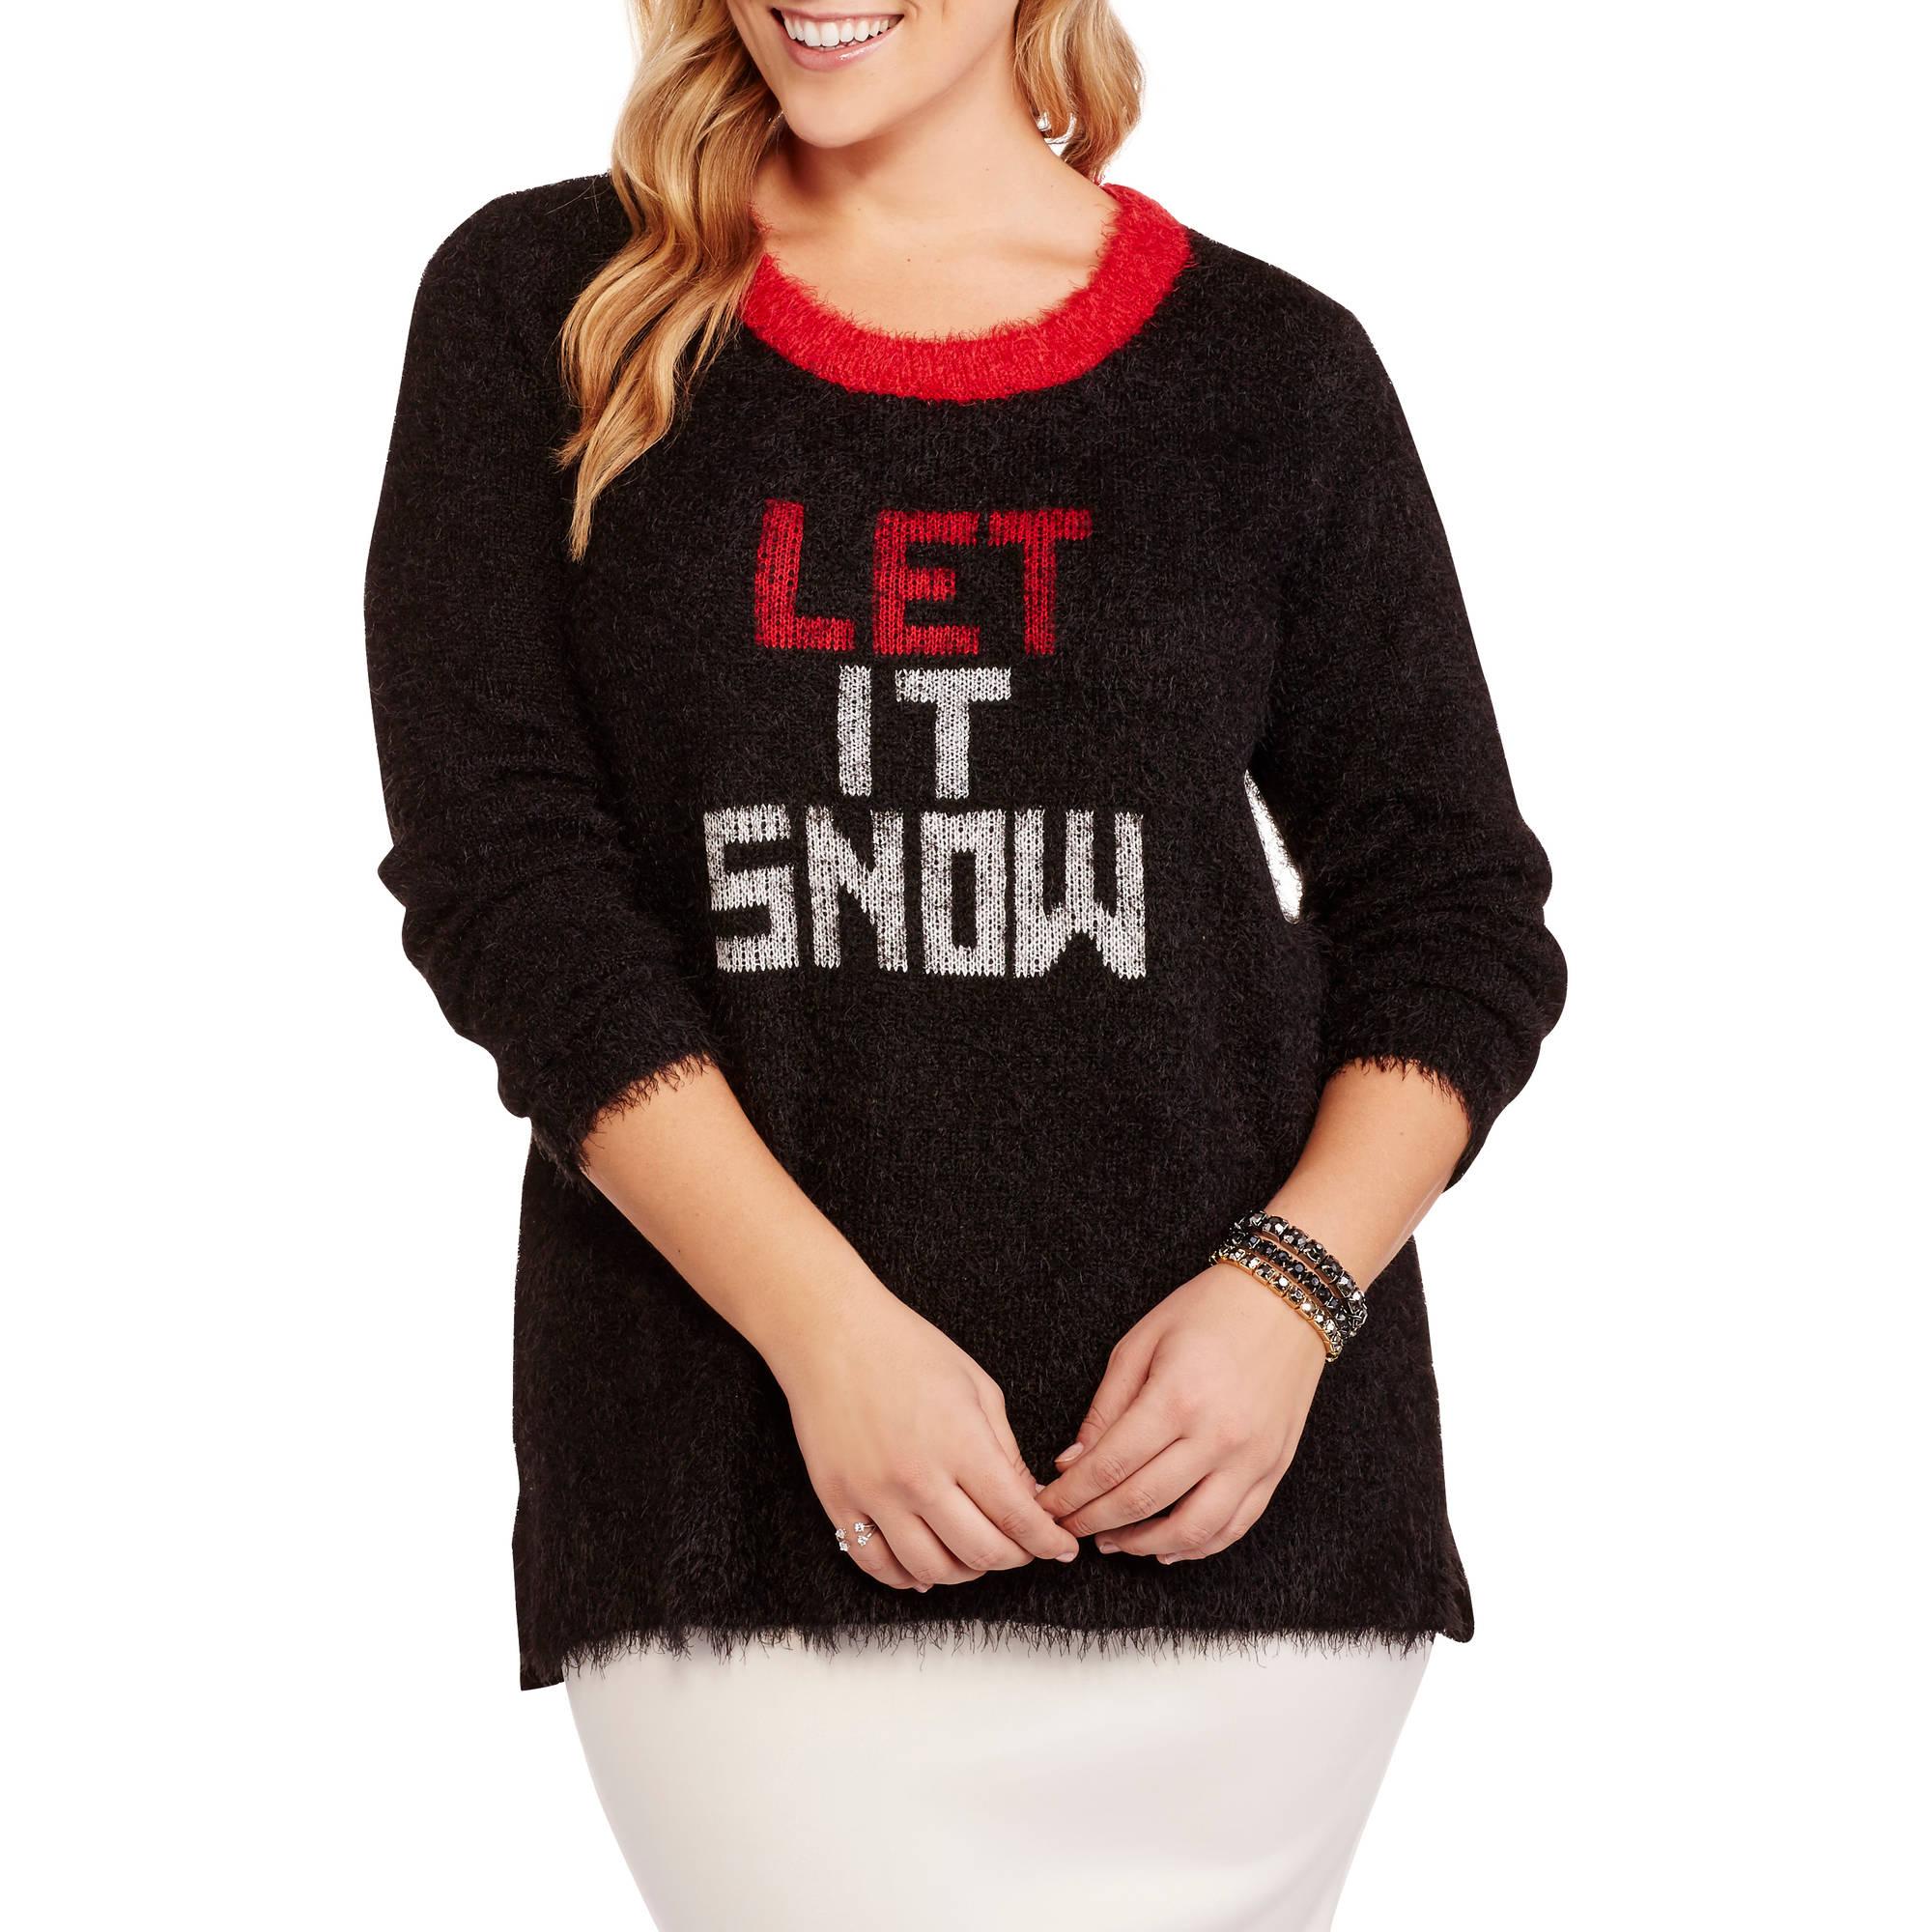 French Laundry Women's Plus Crew Neck Winter Festive Let It Snow Sweater